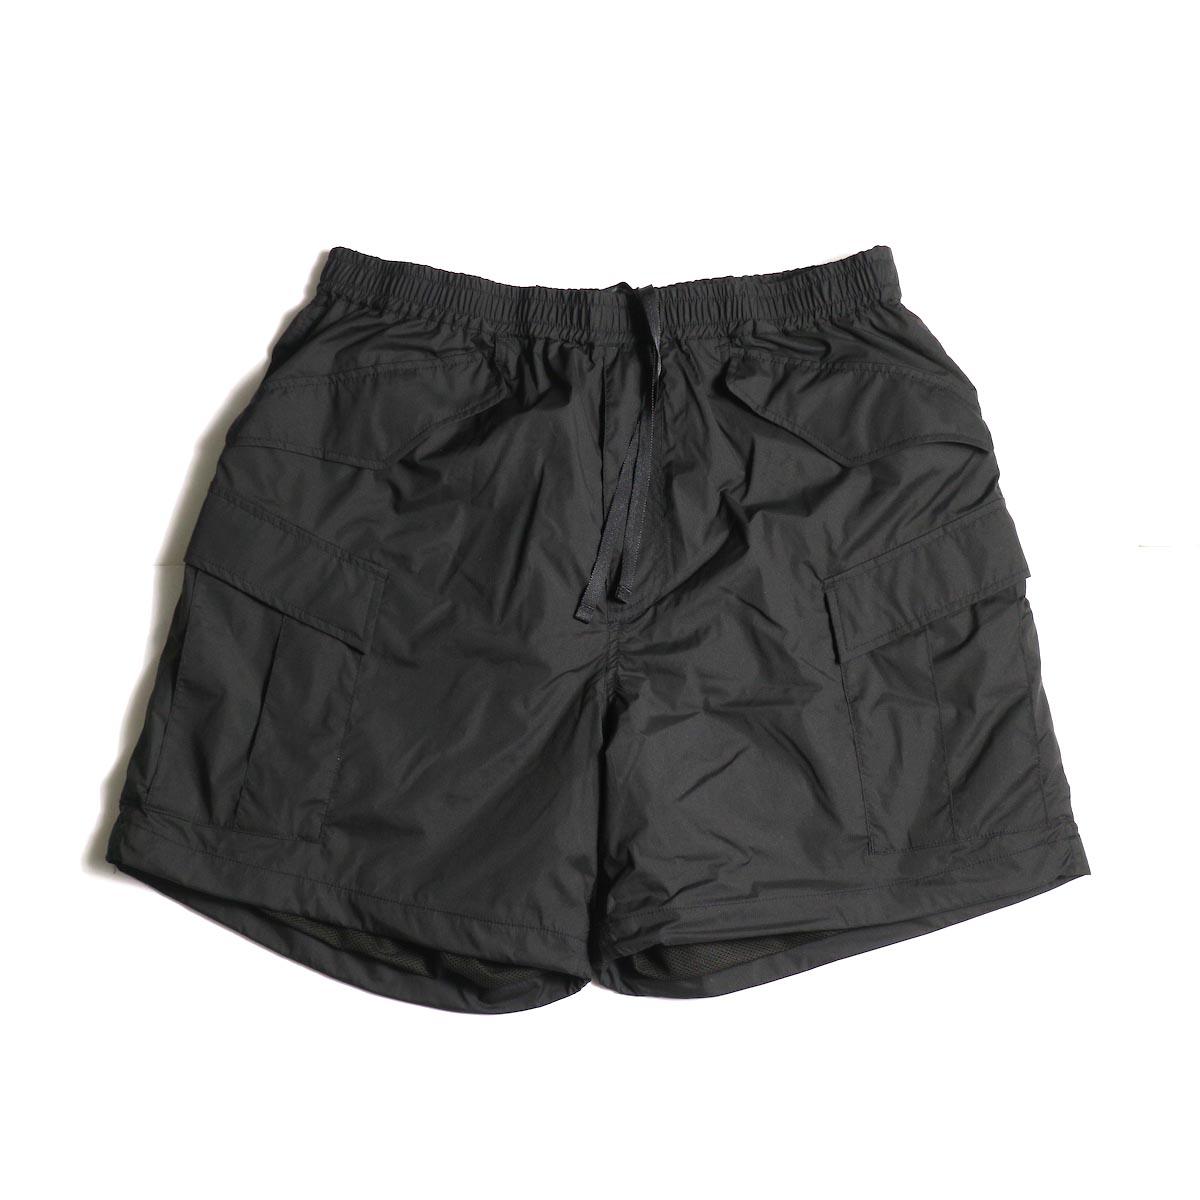 DAIWA PIER39 / Micro Rip-Stop Easy 6P Shorts (Black)